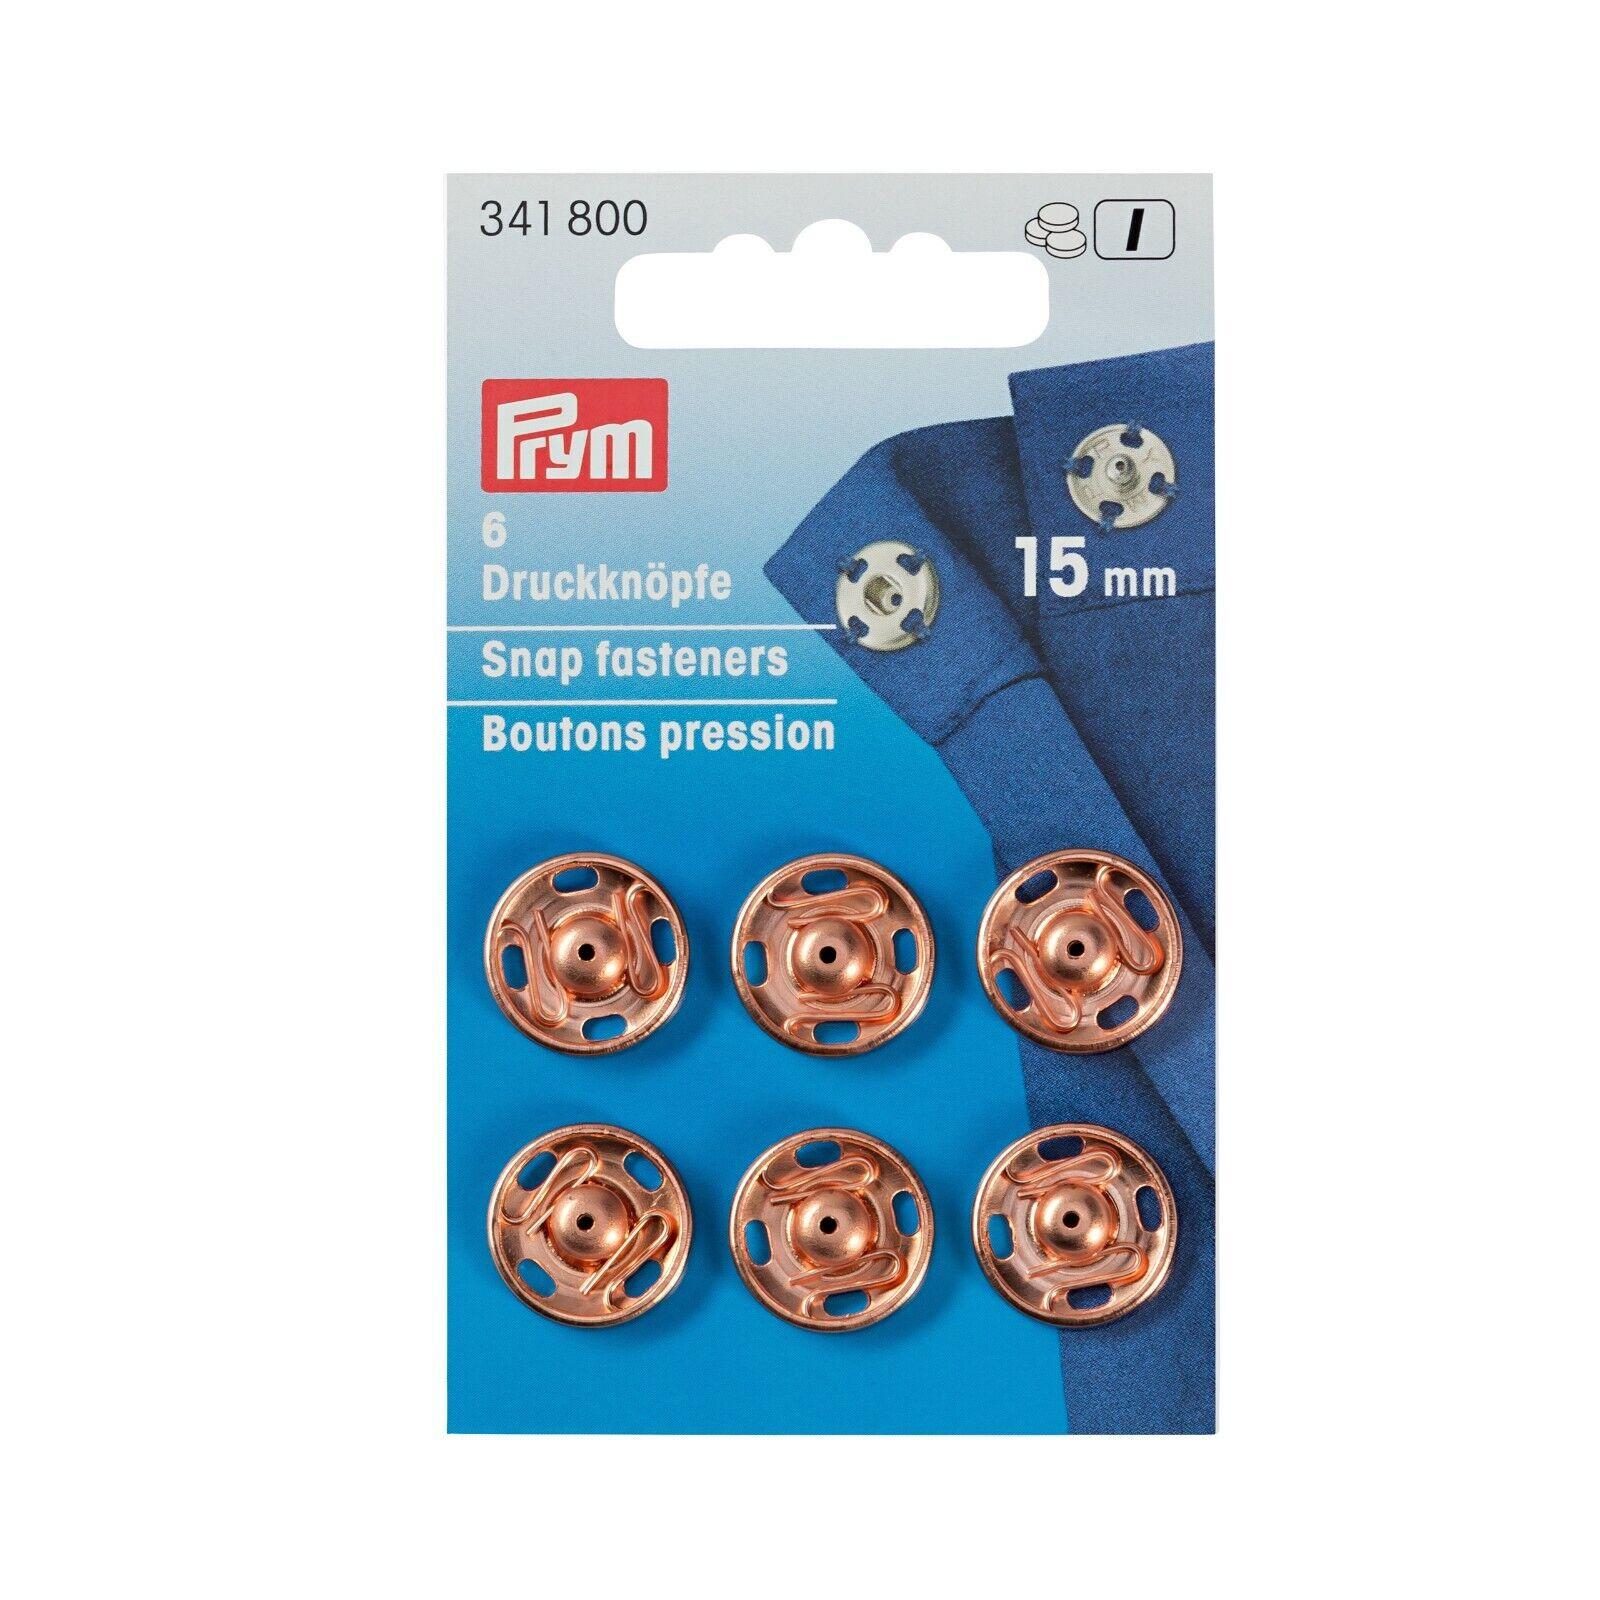 15mm roségold  341800 Prym Annäh-Druckknöpfe